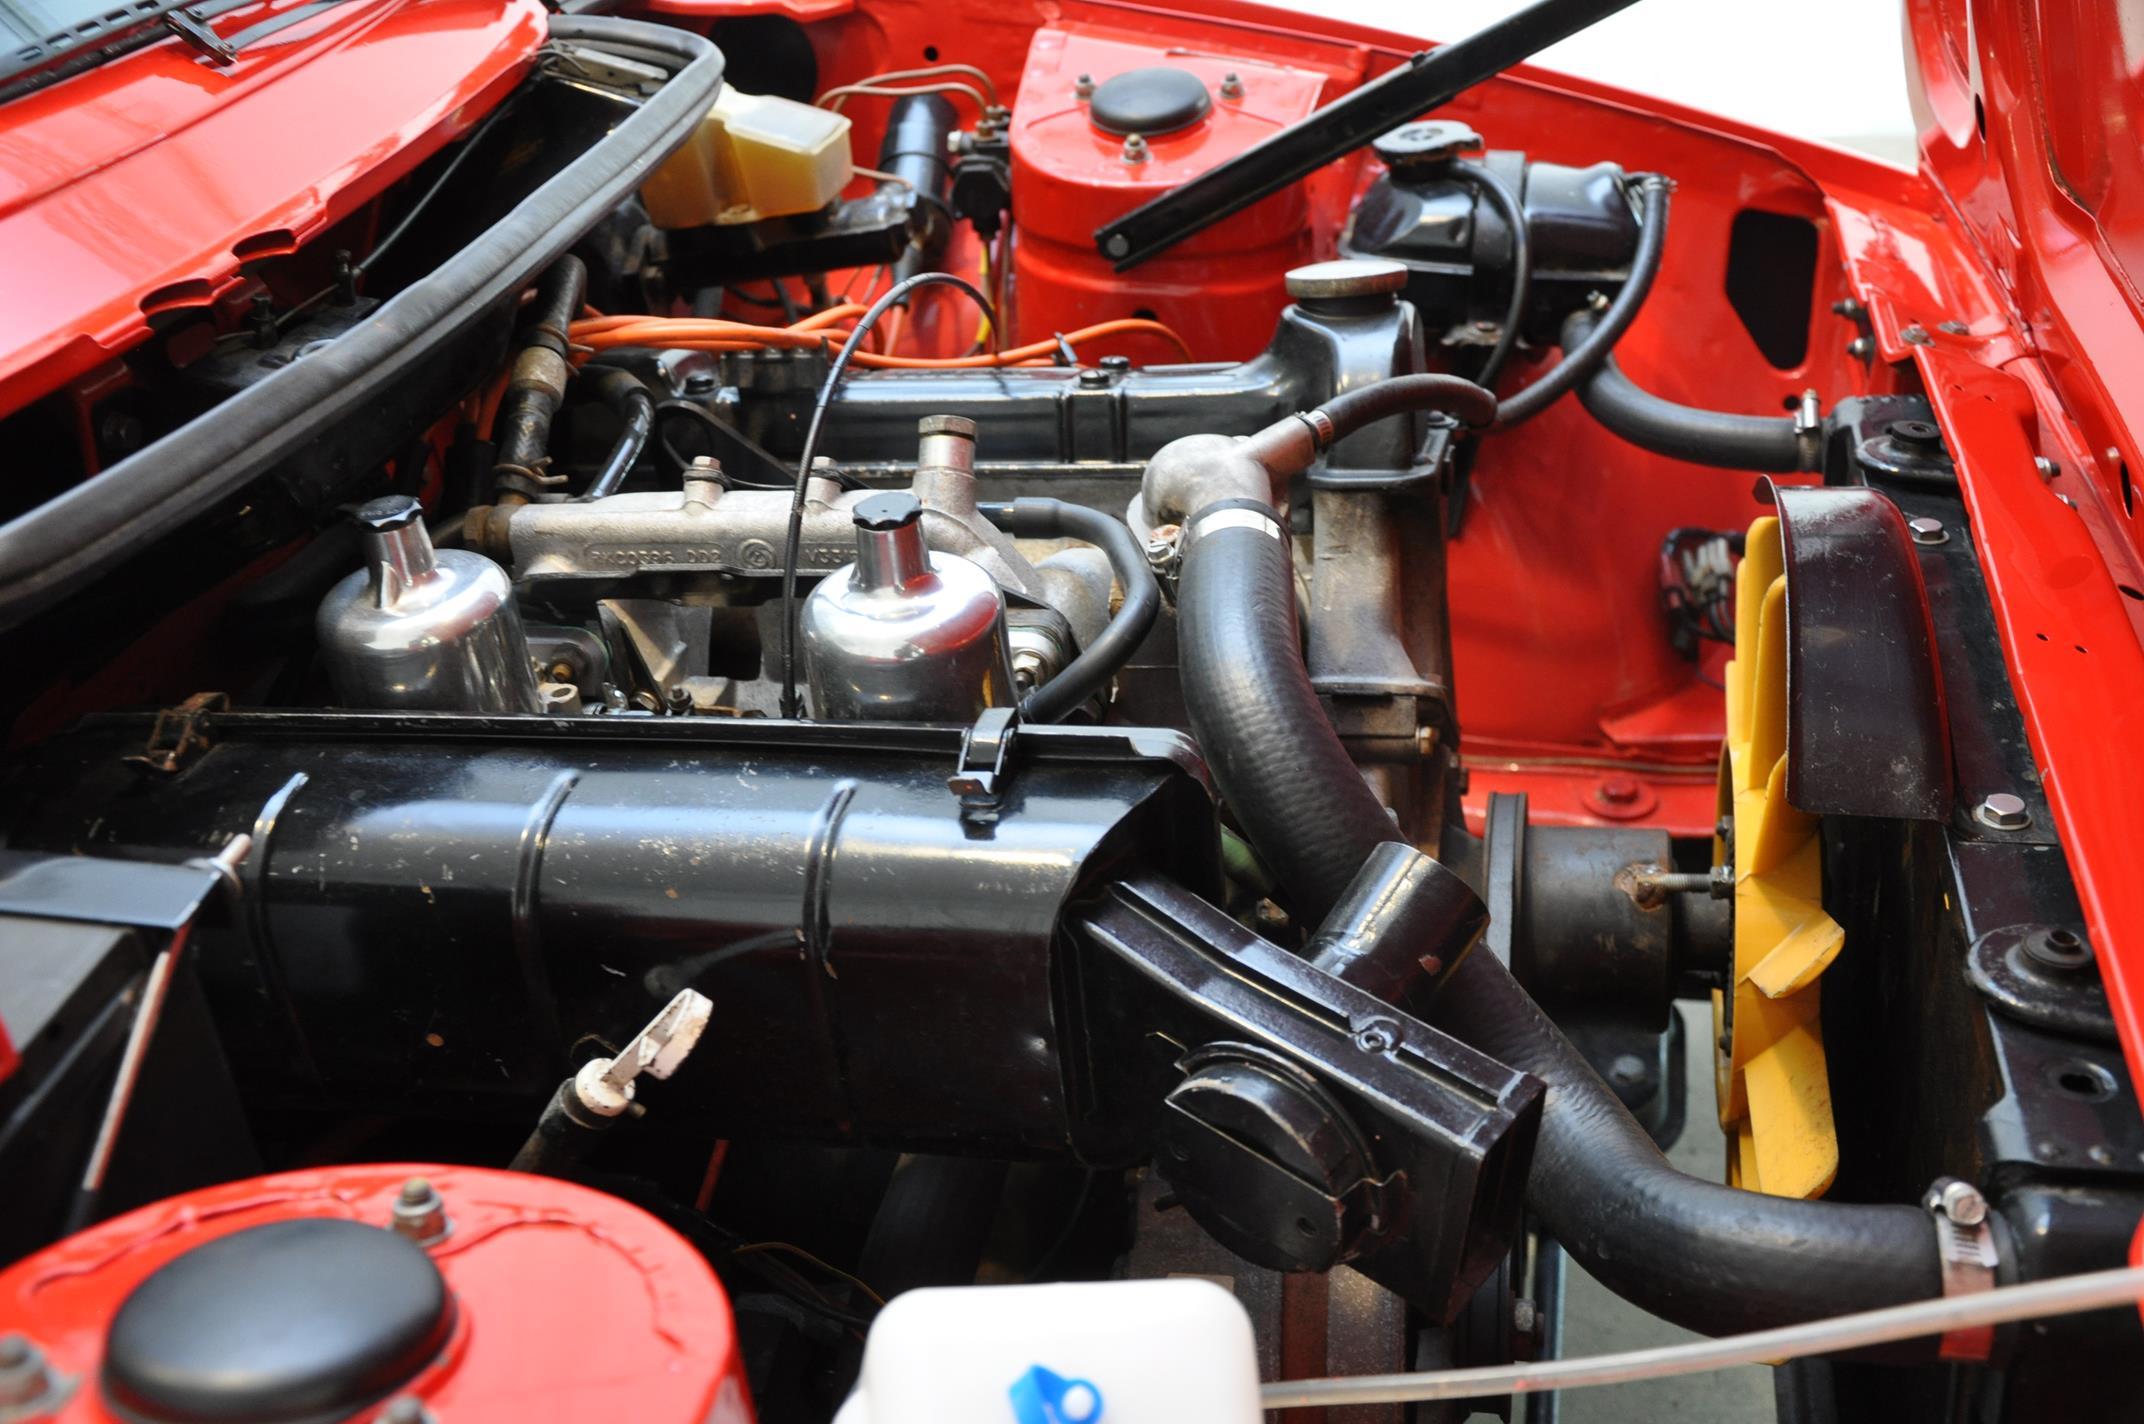 1981 Triumph TR7 | CLASSIC MOTOR SALES